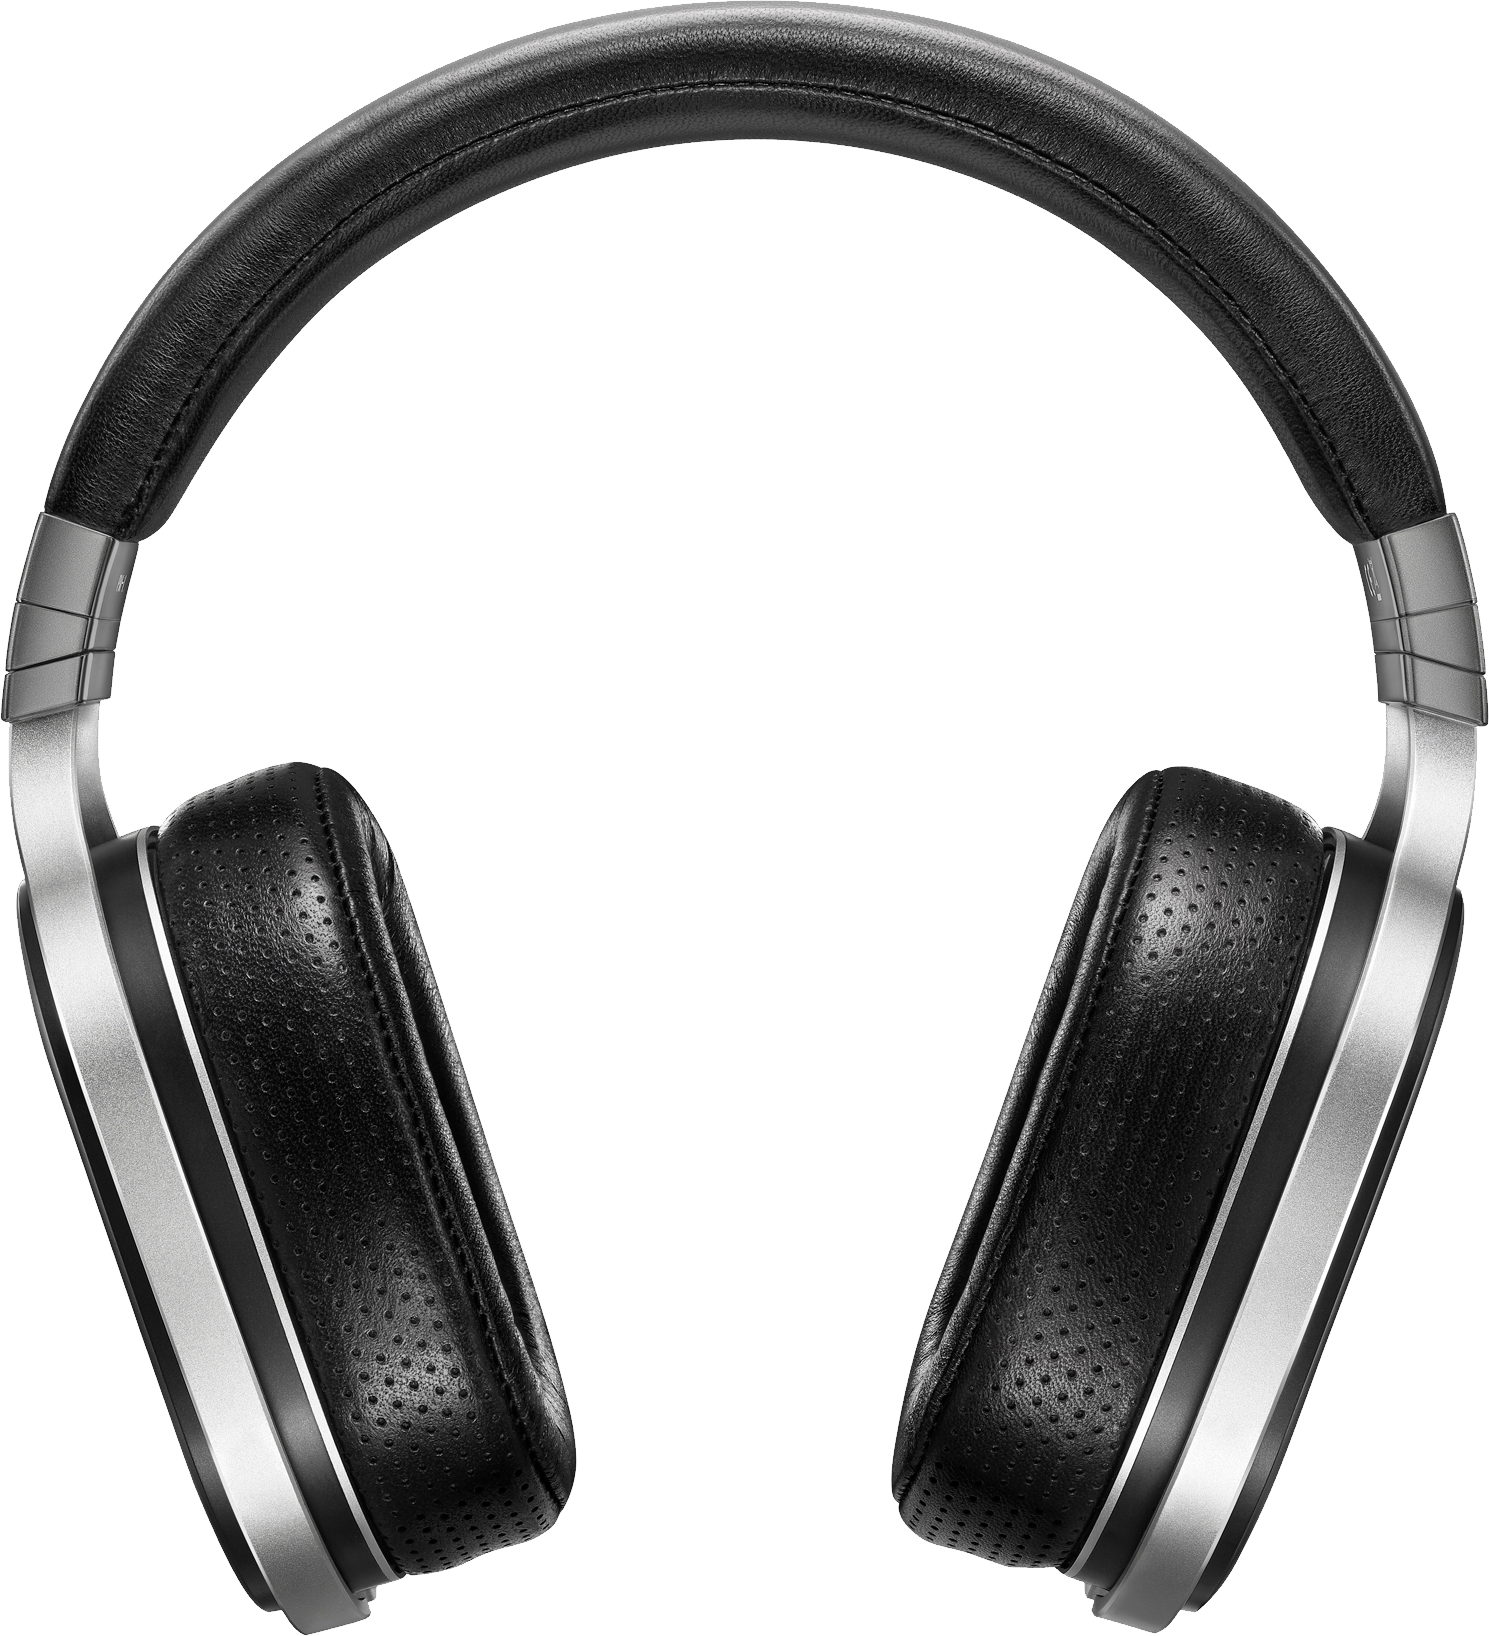 Headphones clipart transparent background. Png image